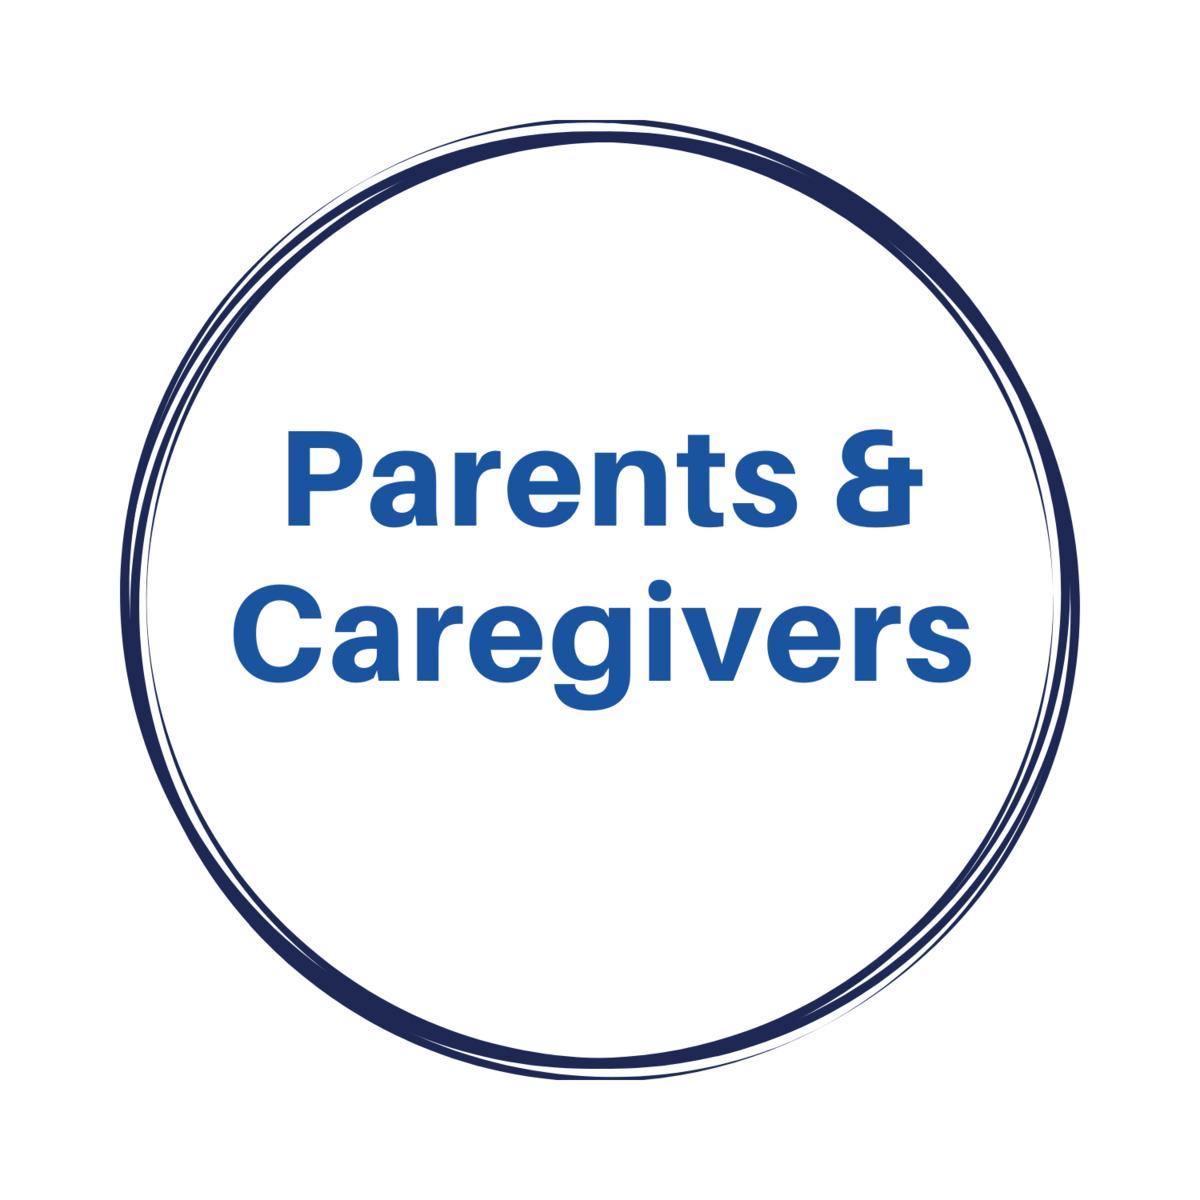 Parents & Caregivers